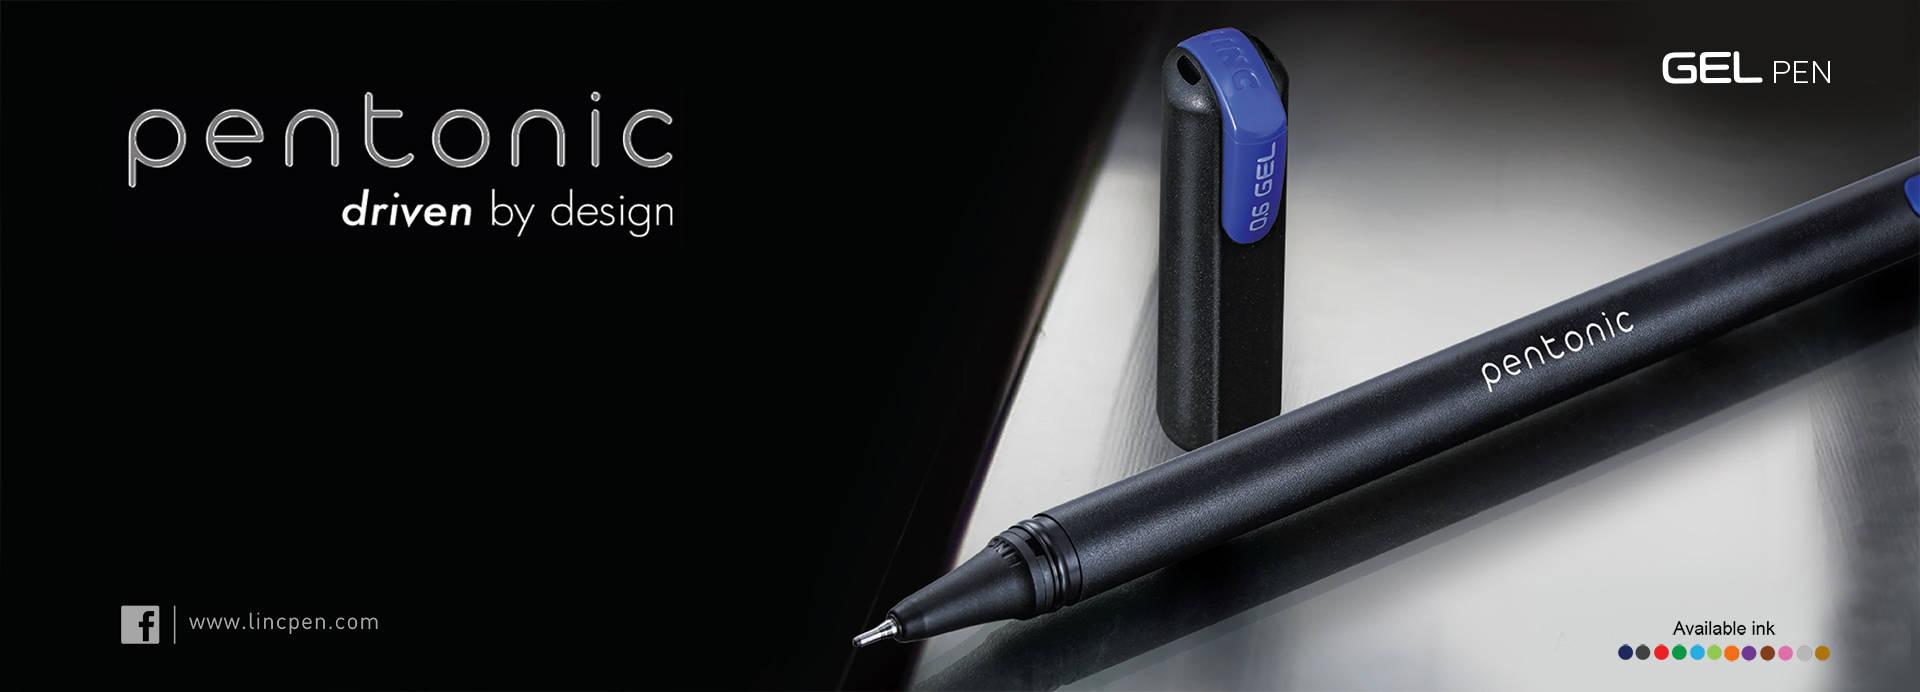 pentonic gel pen price